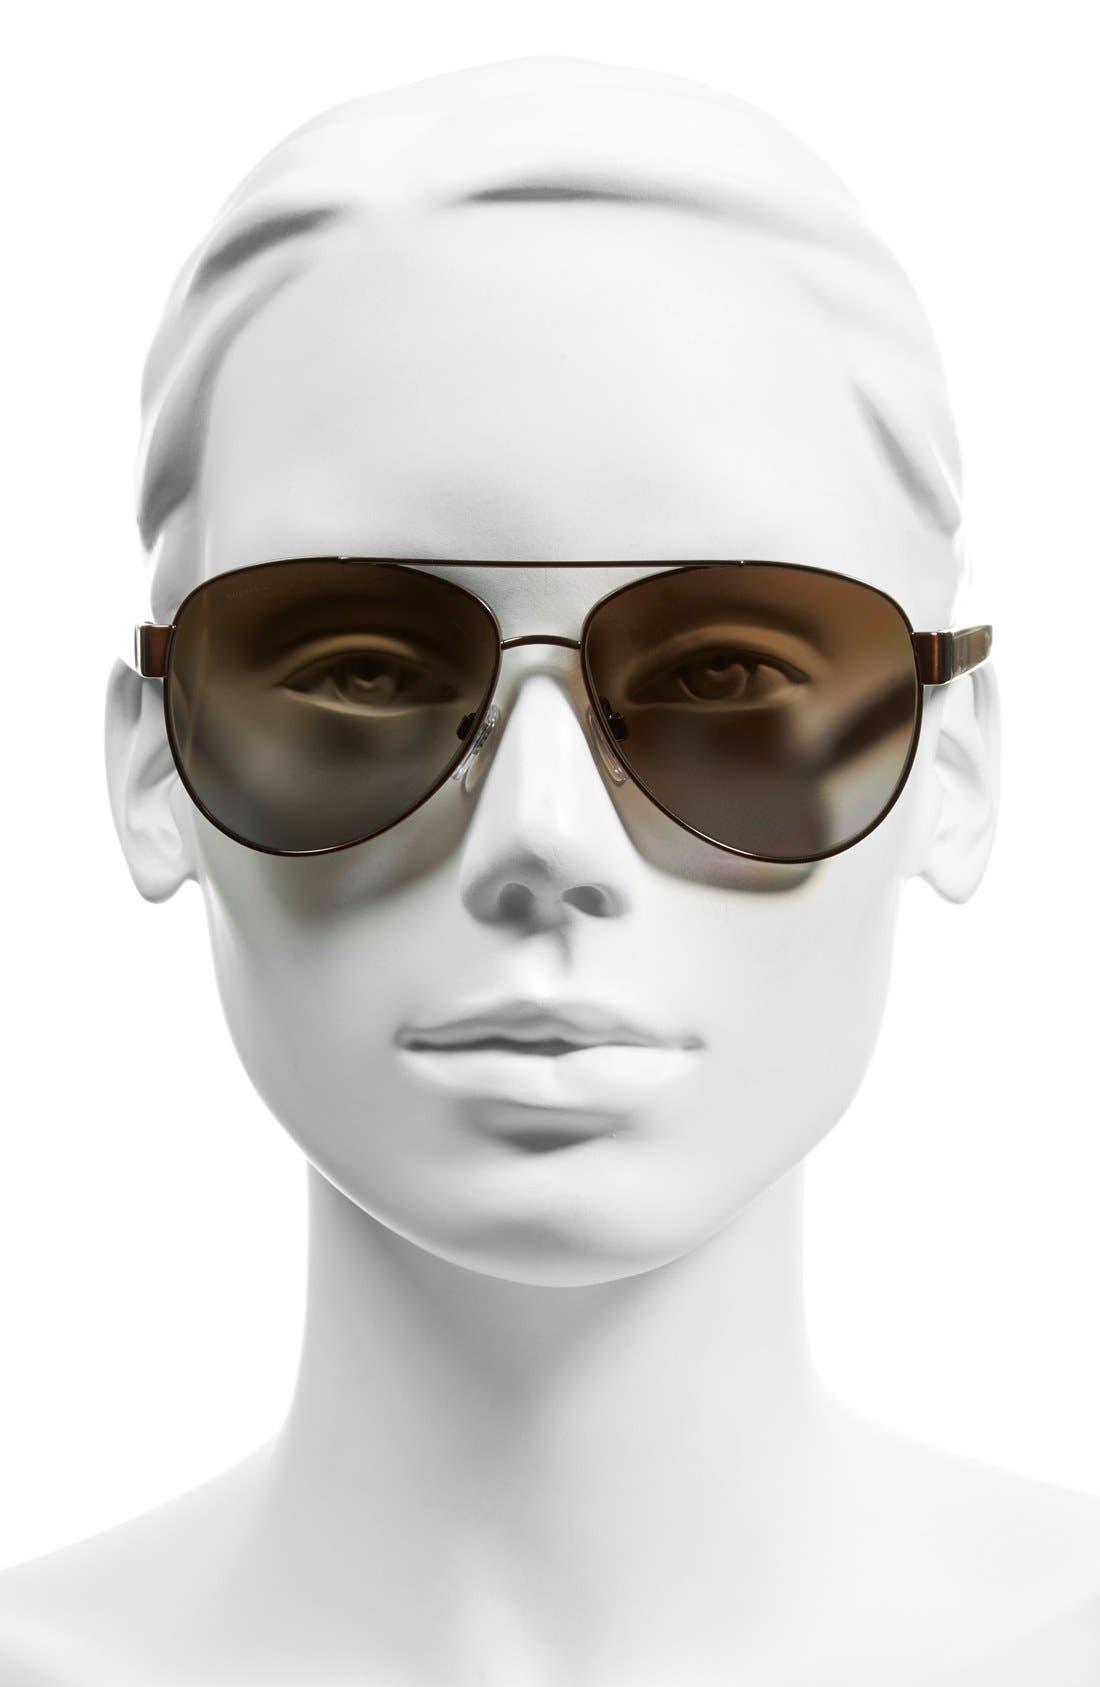 57mm Polarized Aviator Sunglasses,                             Alternate thumbnail 5, color,